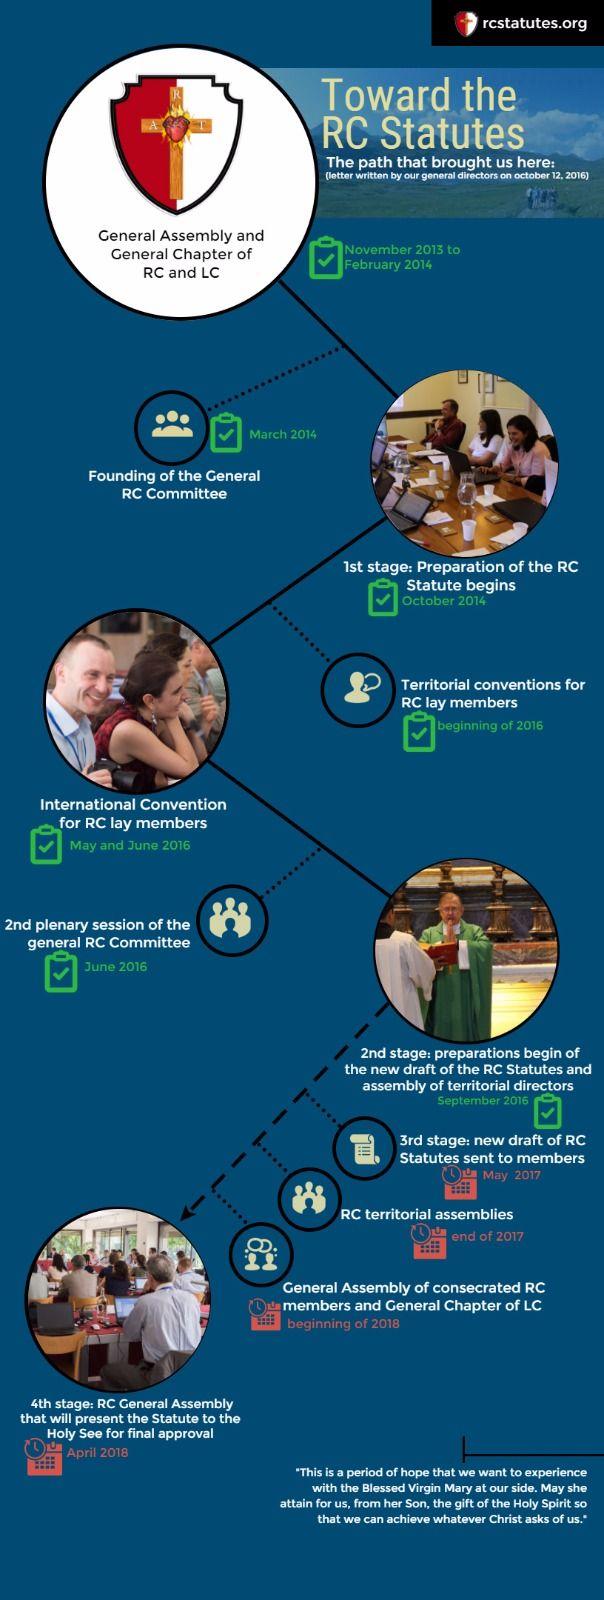 Timeline of the process towards the Regnum Christi Statutes.